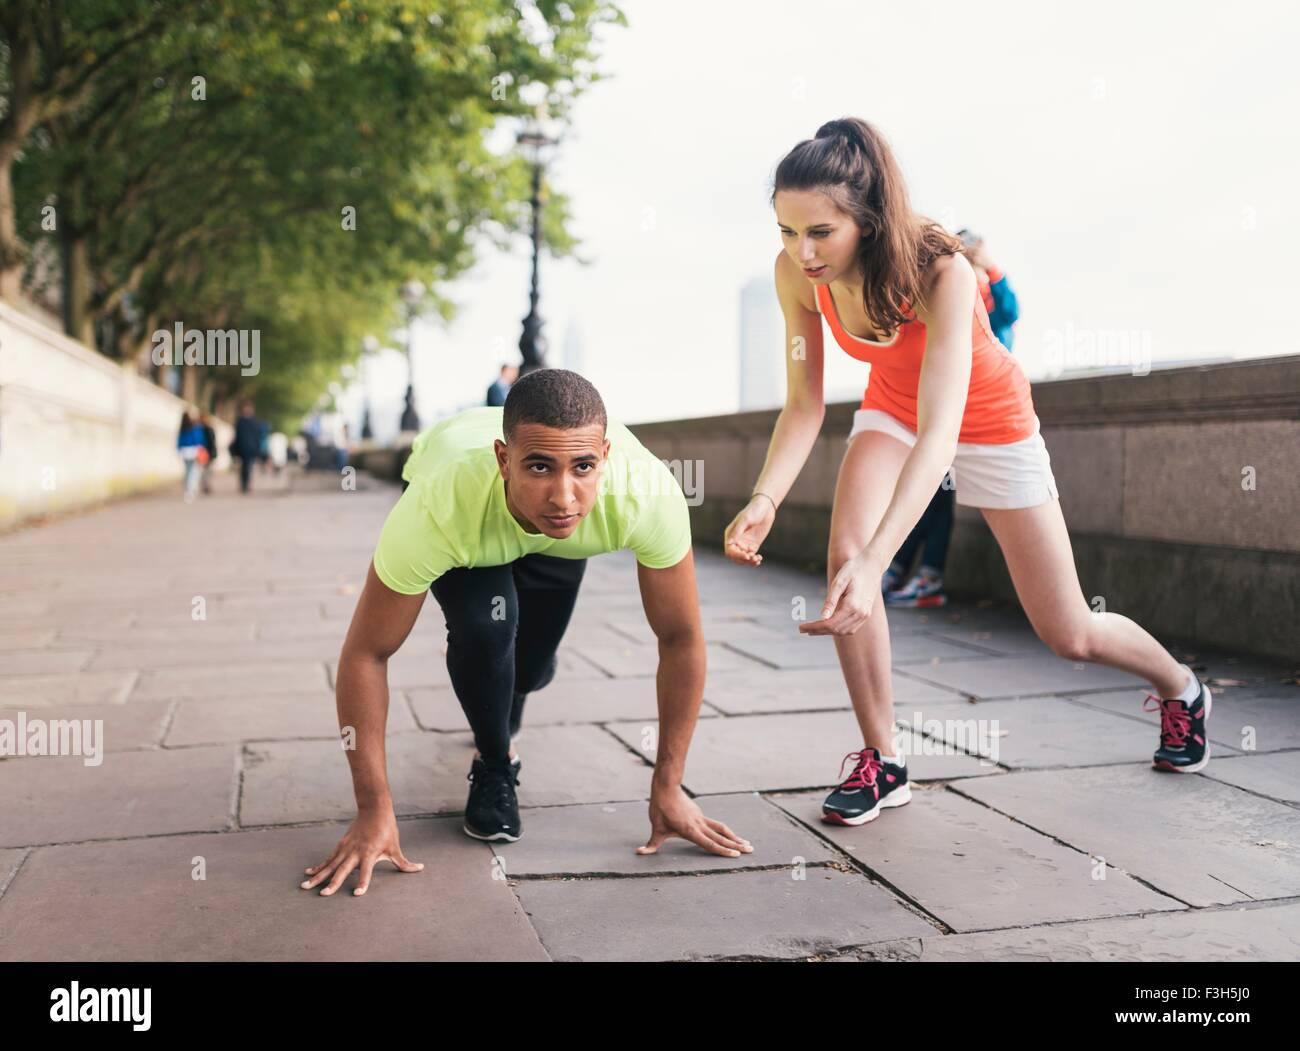 Sportlehrer fickt seine junge Fitness Schülerin durch